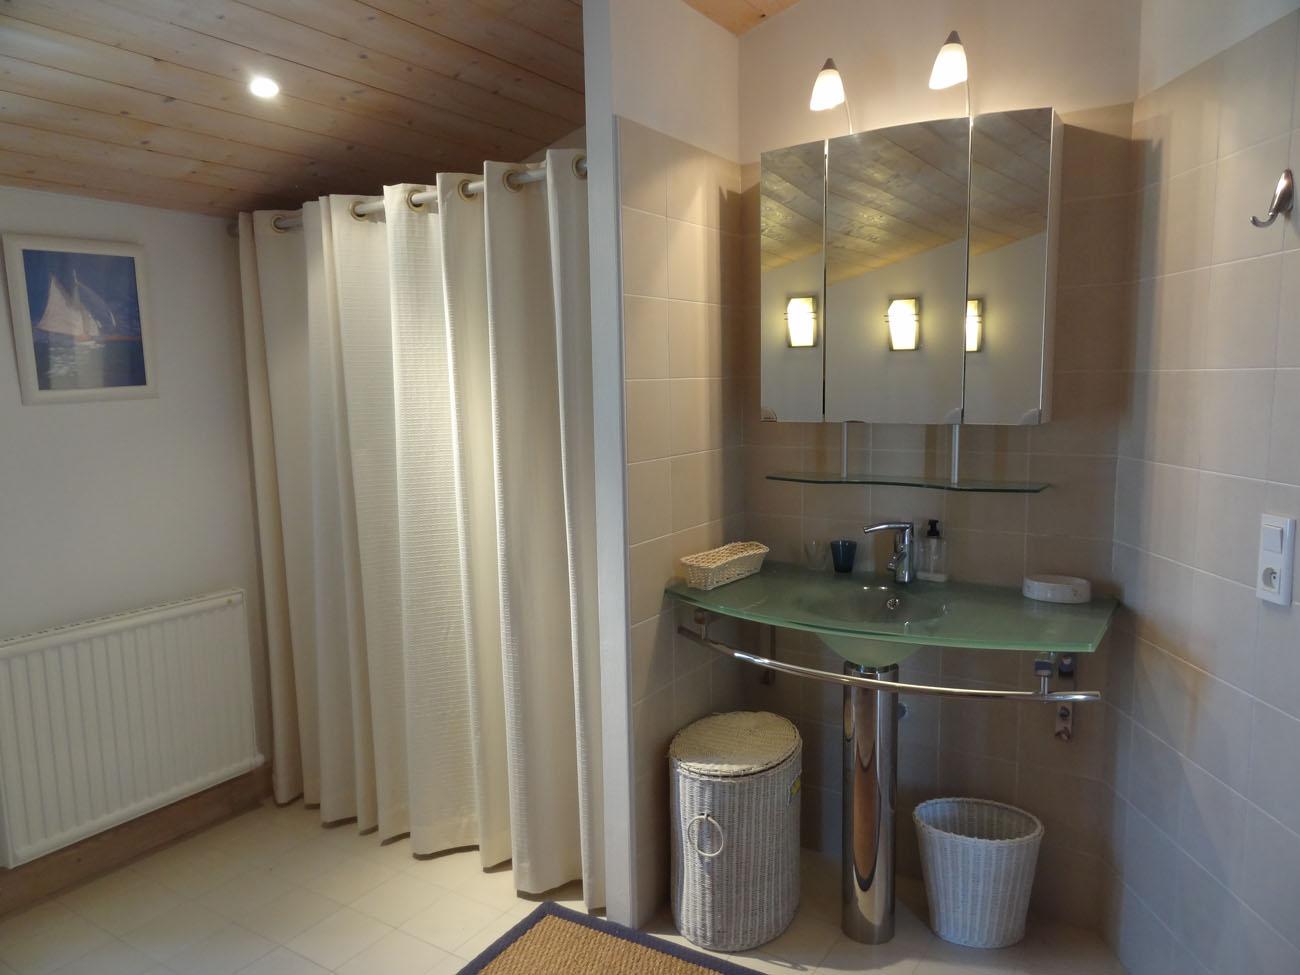 Location Maison Ile de Ré - Campanule - Salle de bain